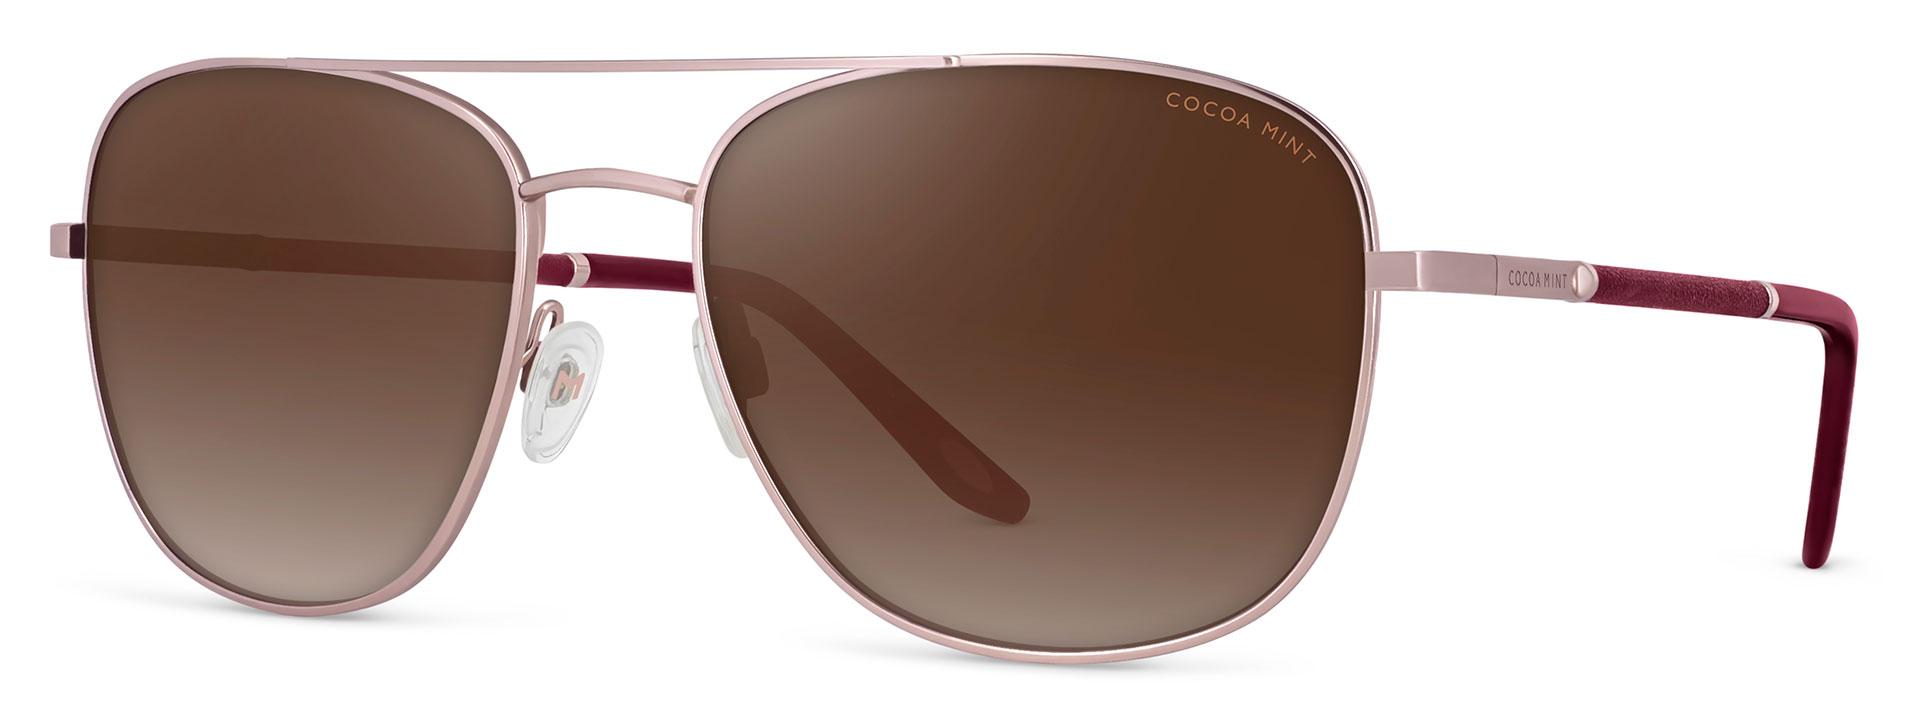 Cocoa Mint Sun Glasses - C1 Rose Gold - CMS2565-C1